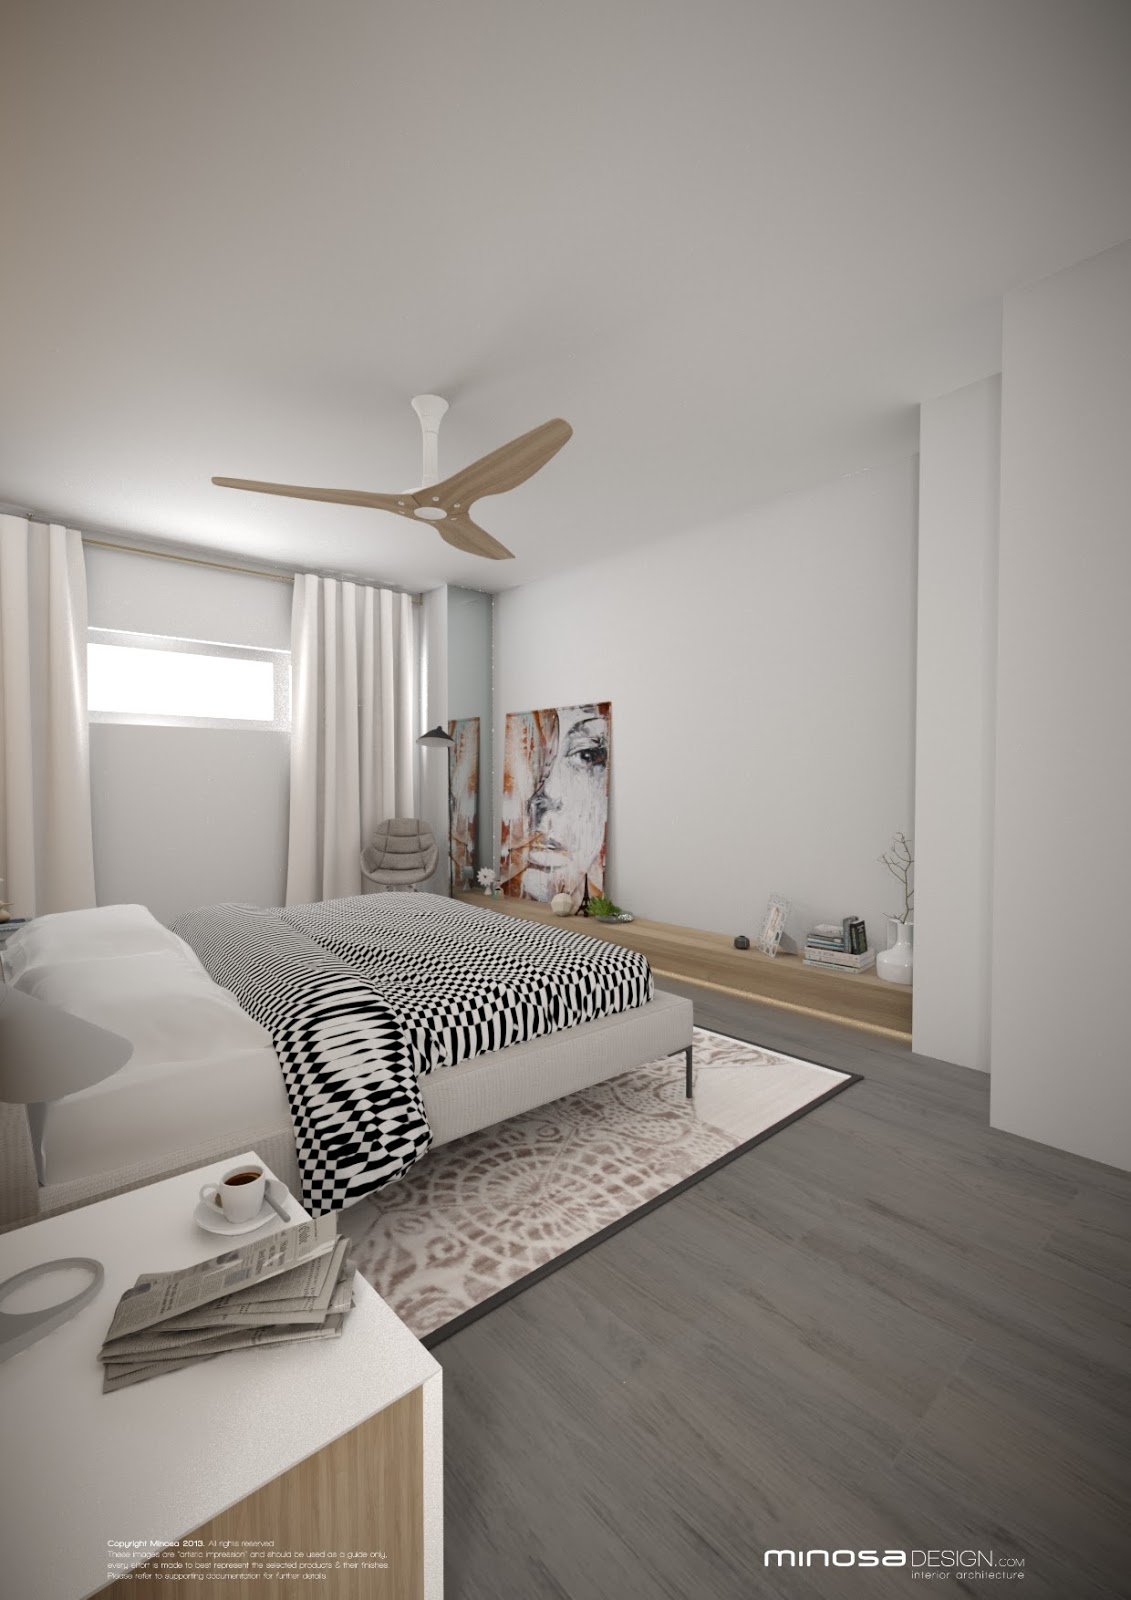 Minosa: Master Bedroom Or Parents Retreat